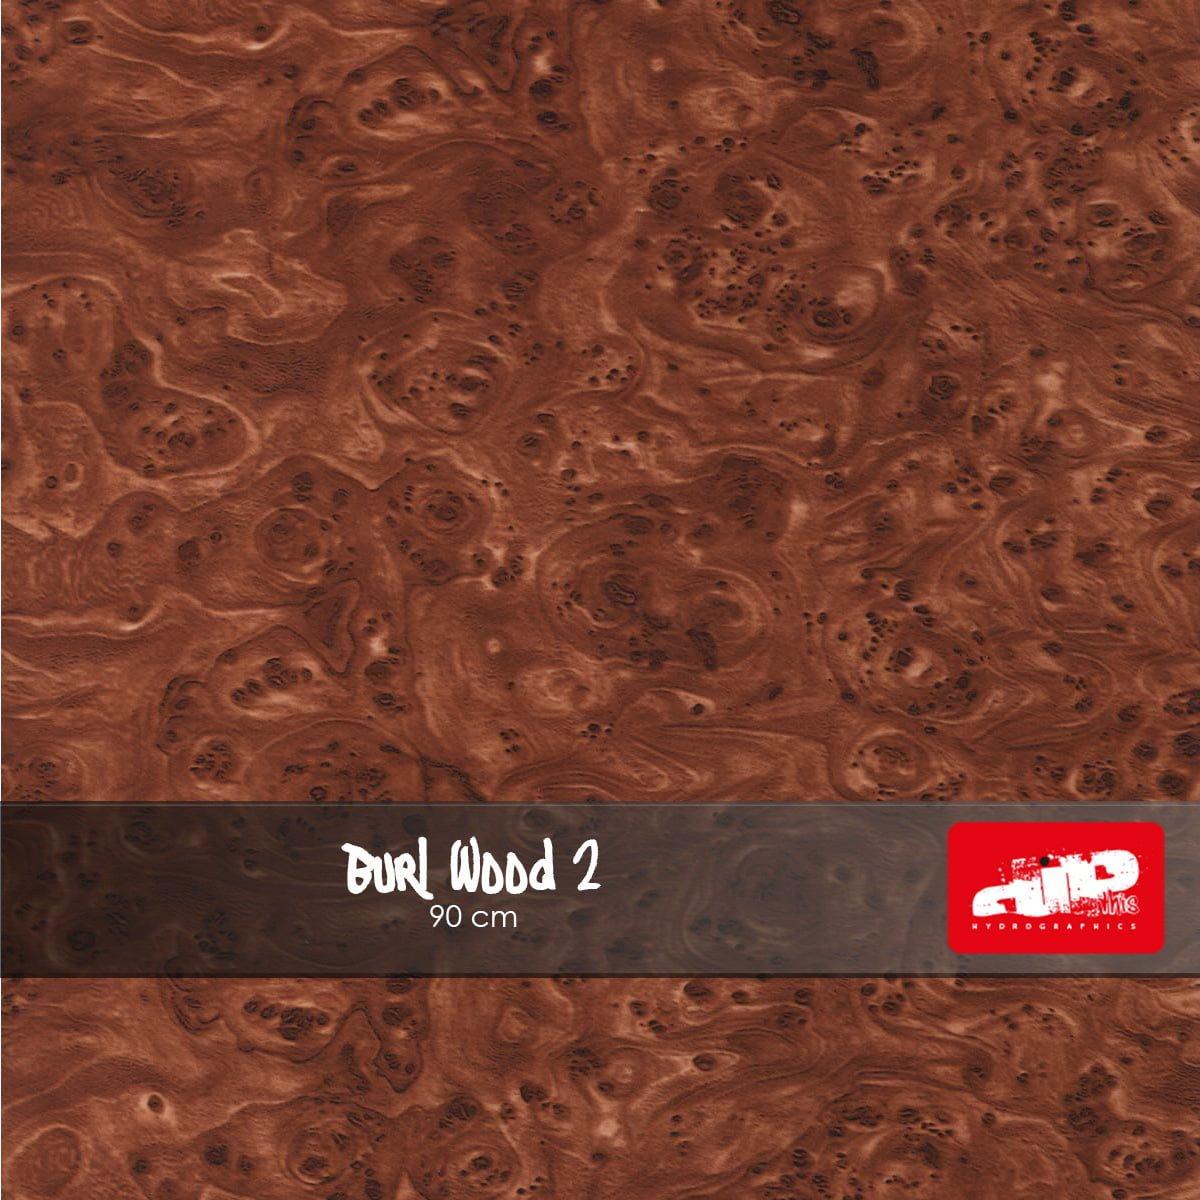 Burl Wood 2